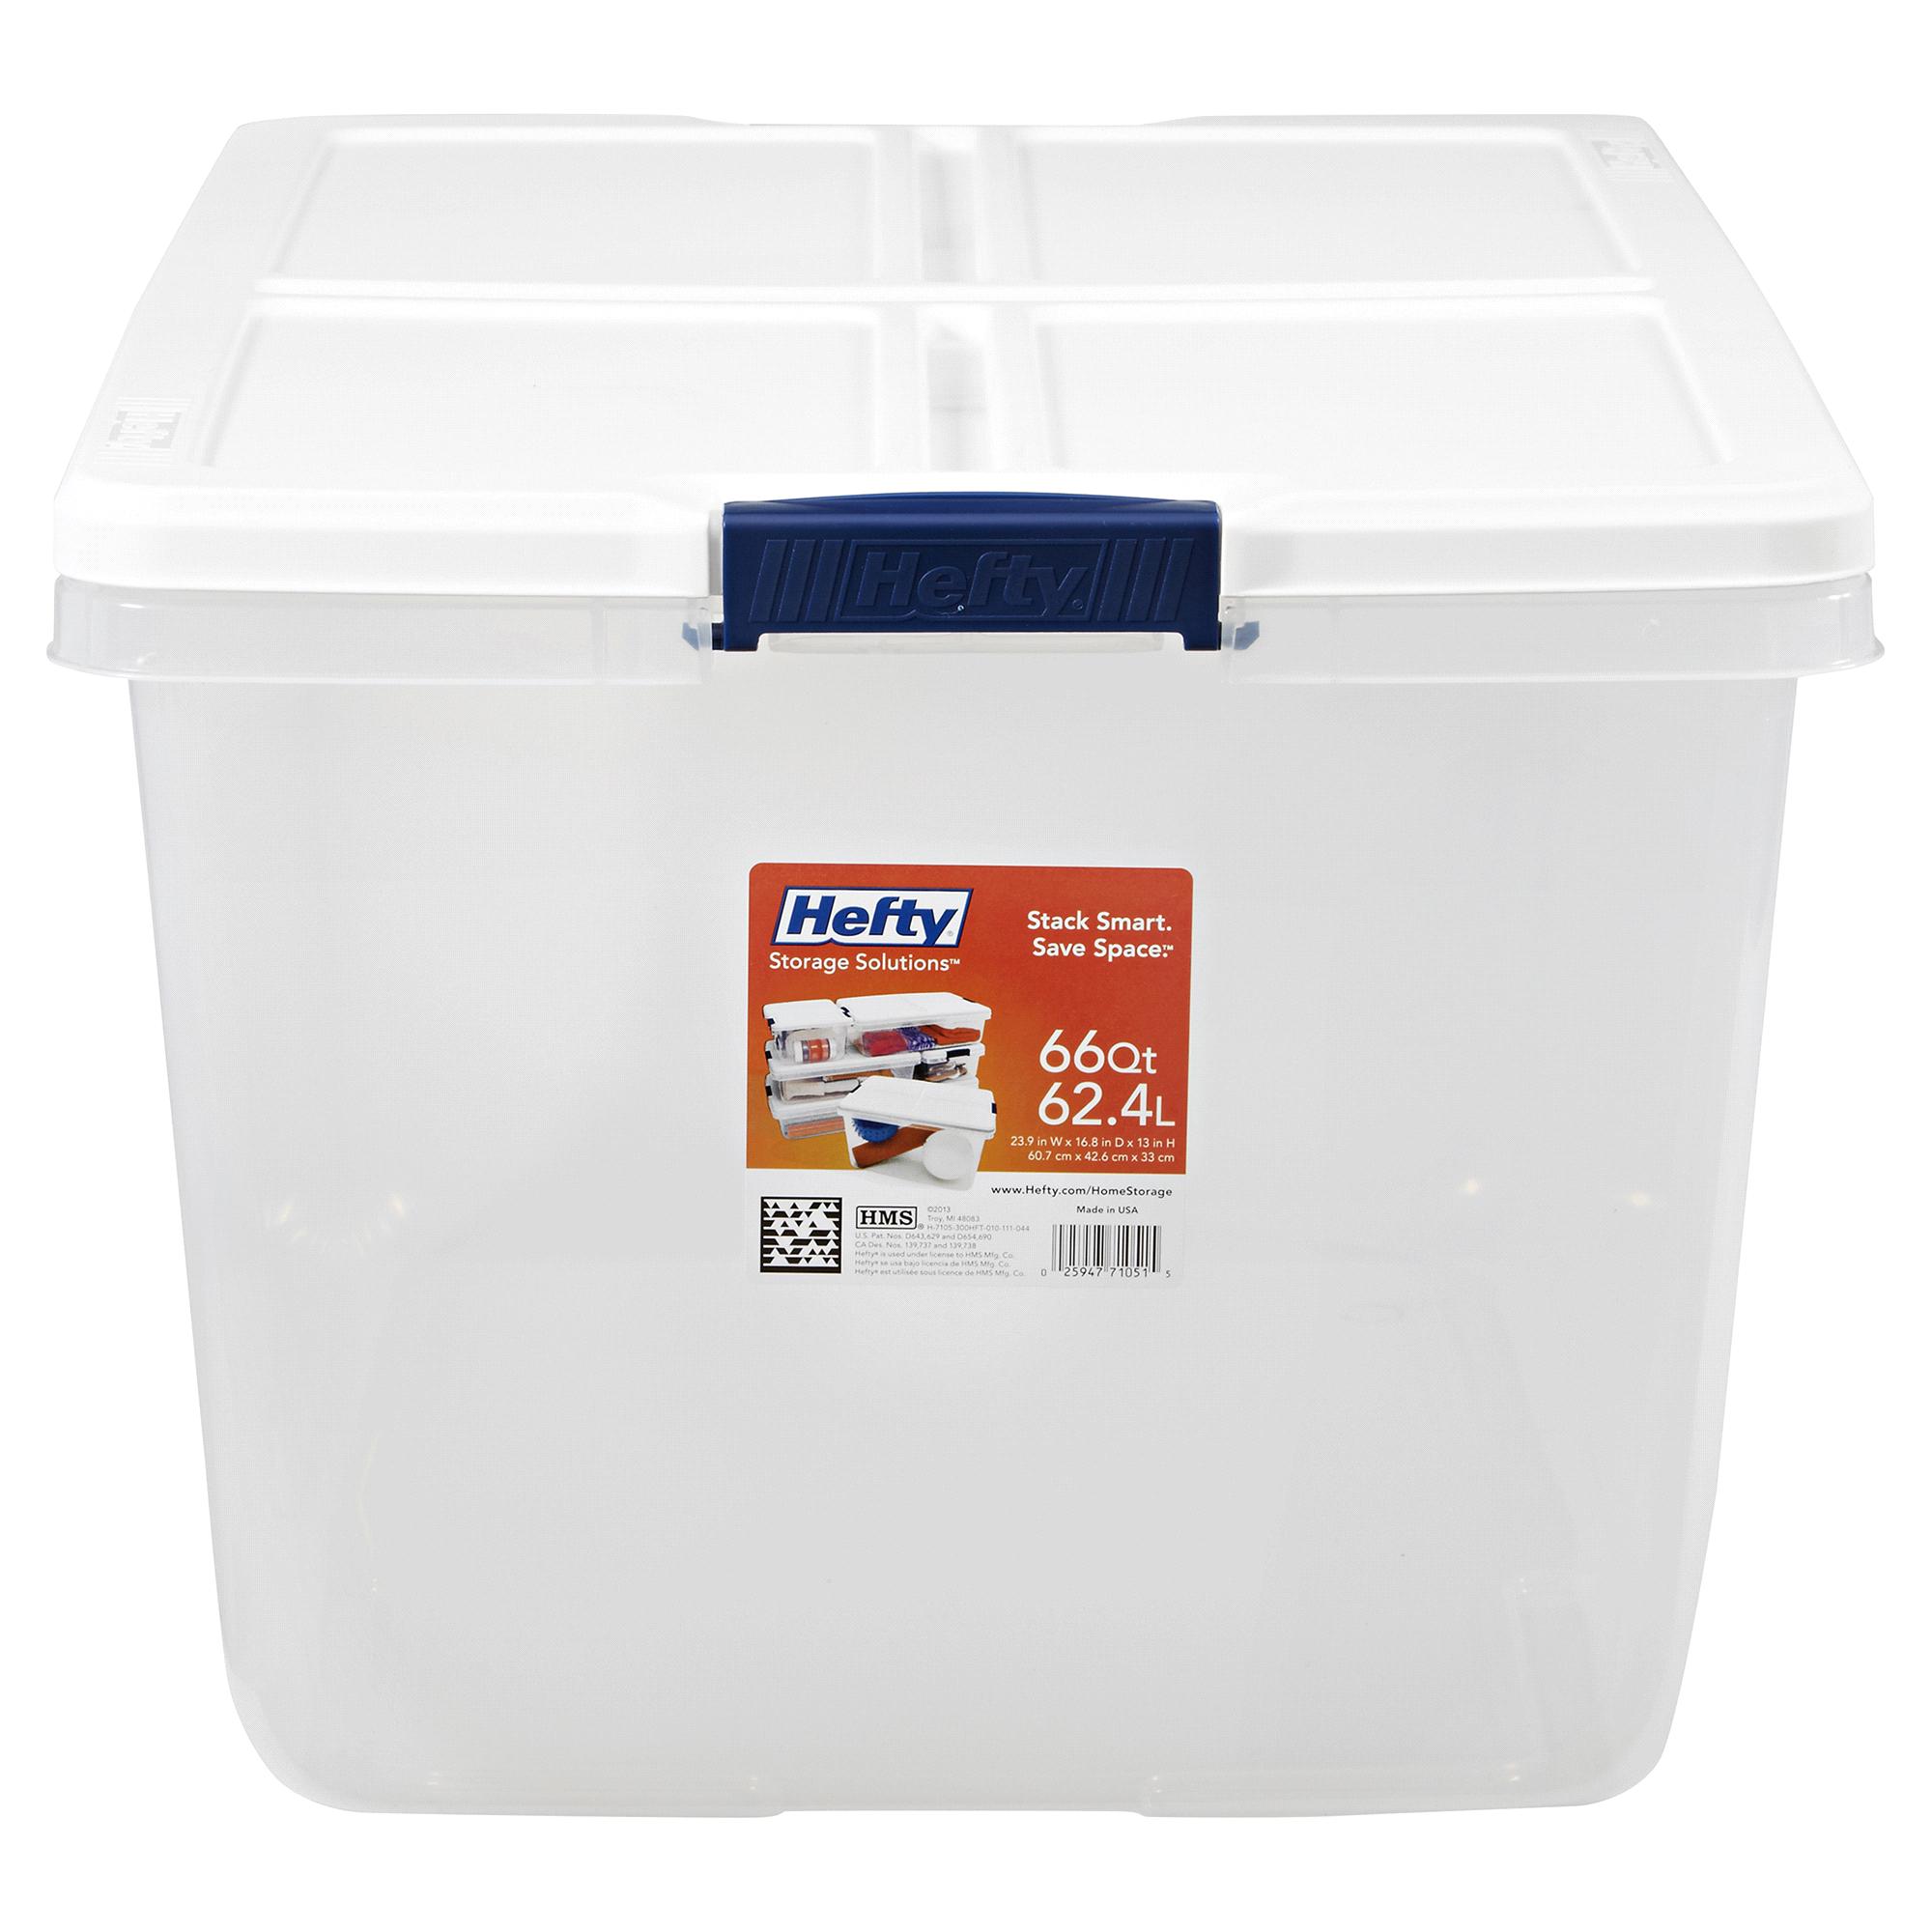 Hefty Storage Tote 66 Quart Clear | Meijer.com